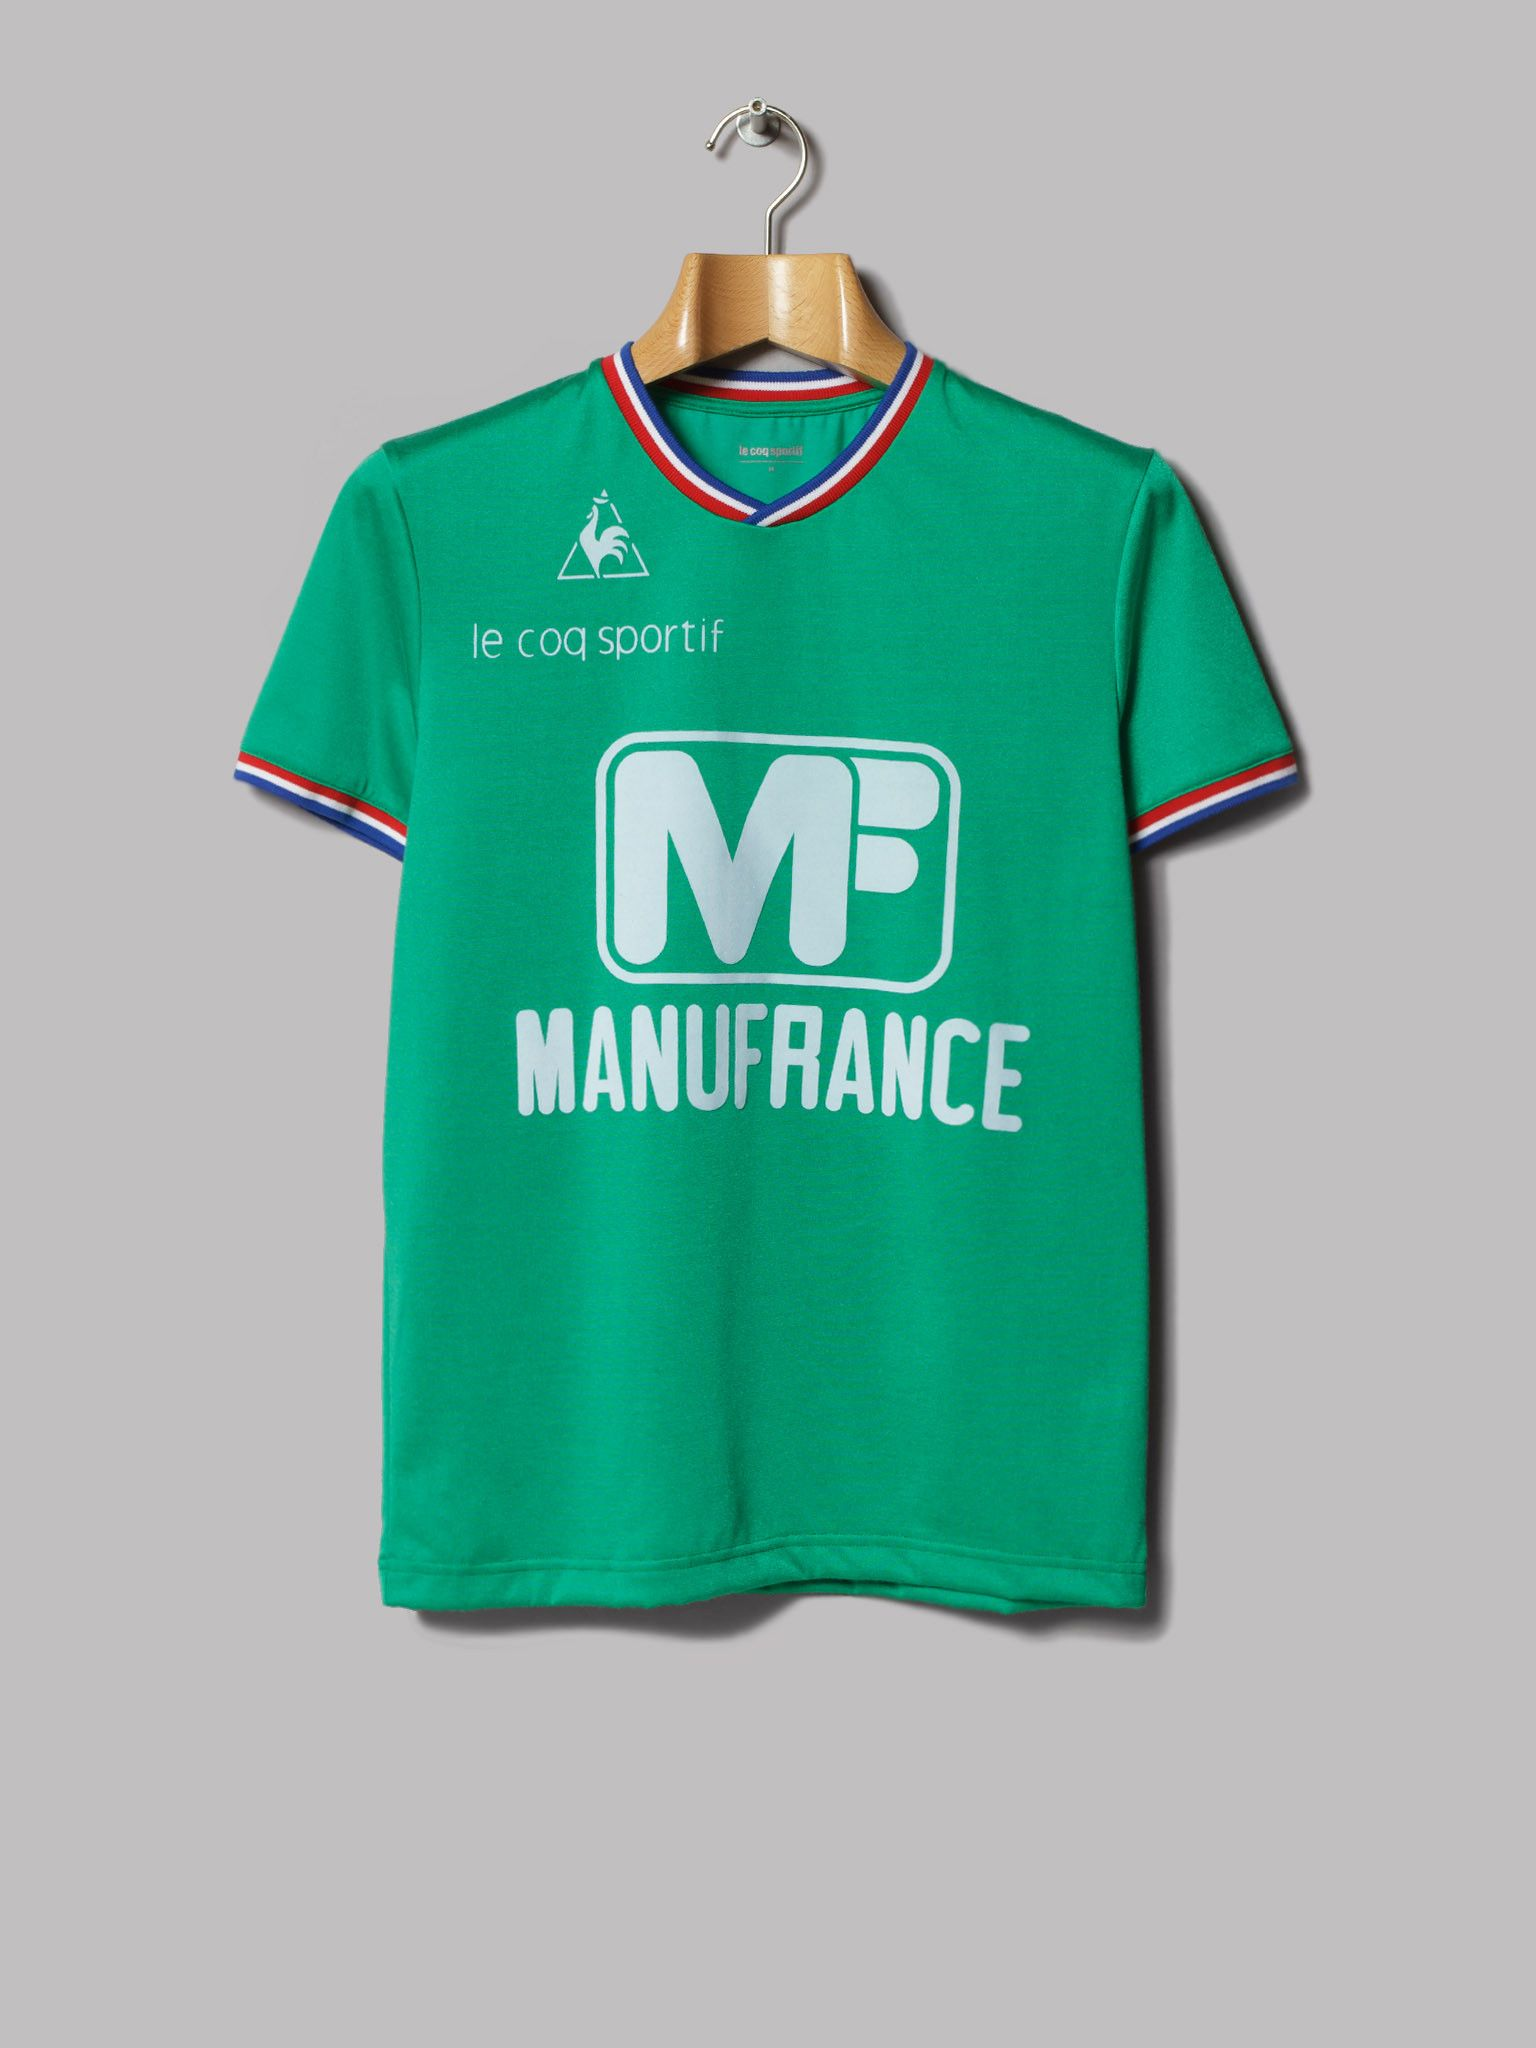 Le Coq Sportif Verts Jersey (St Etienne)